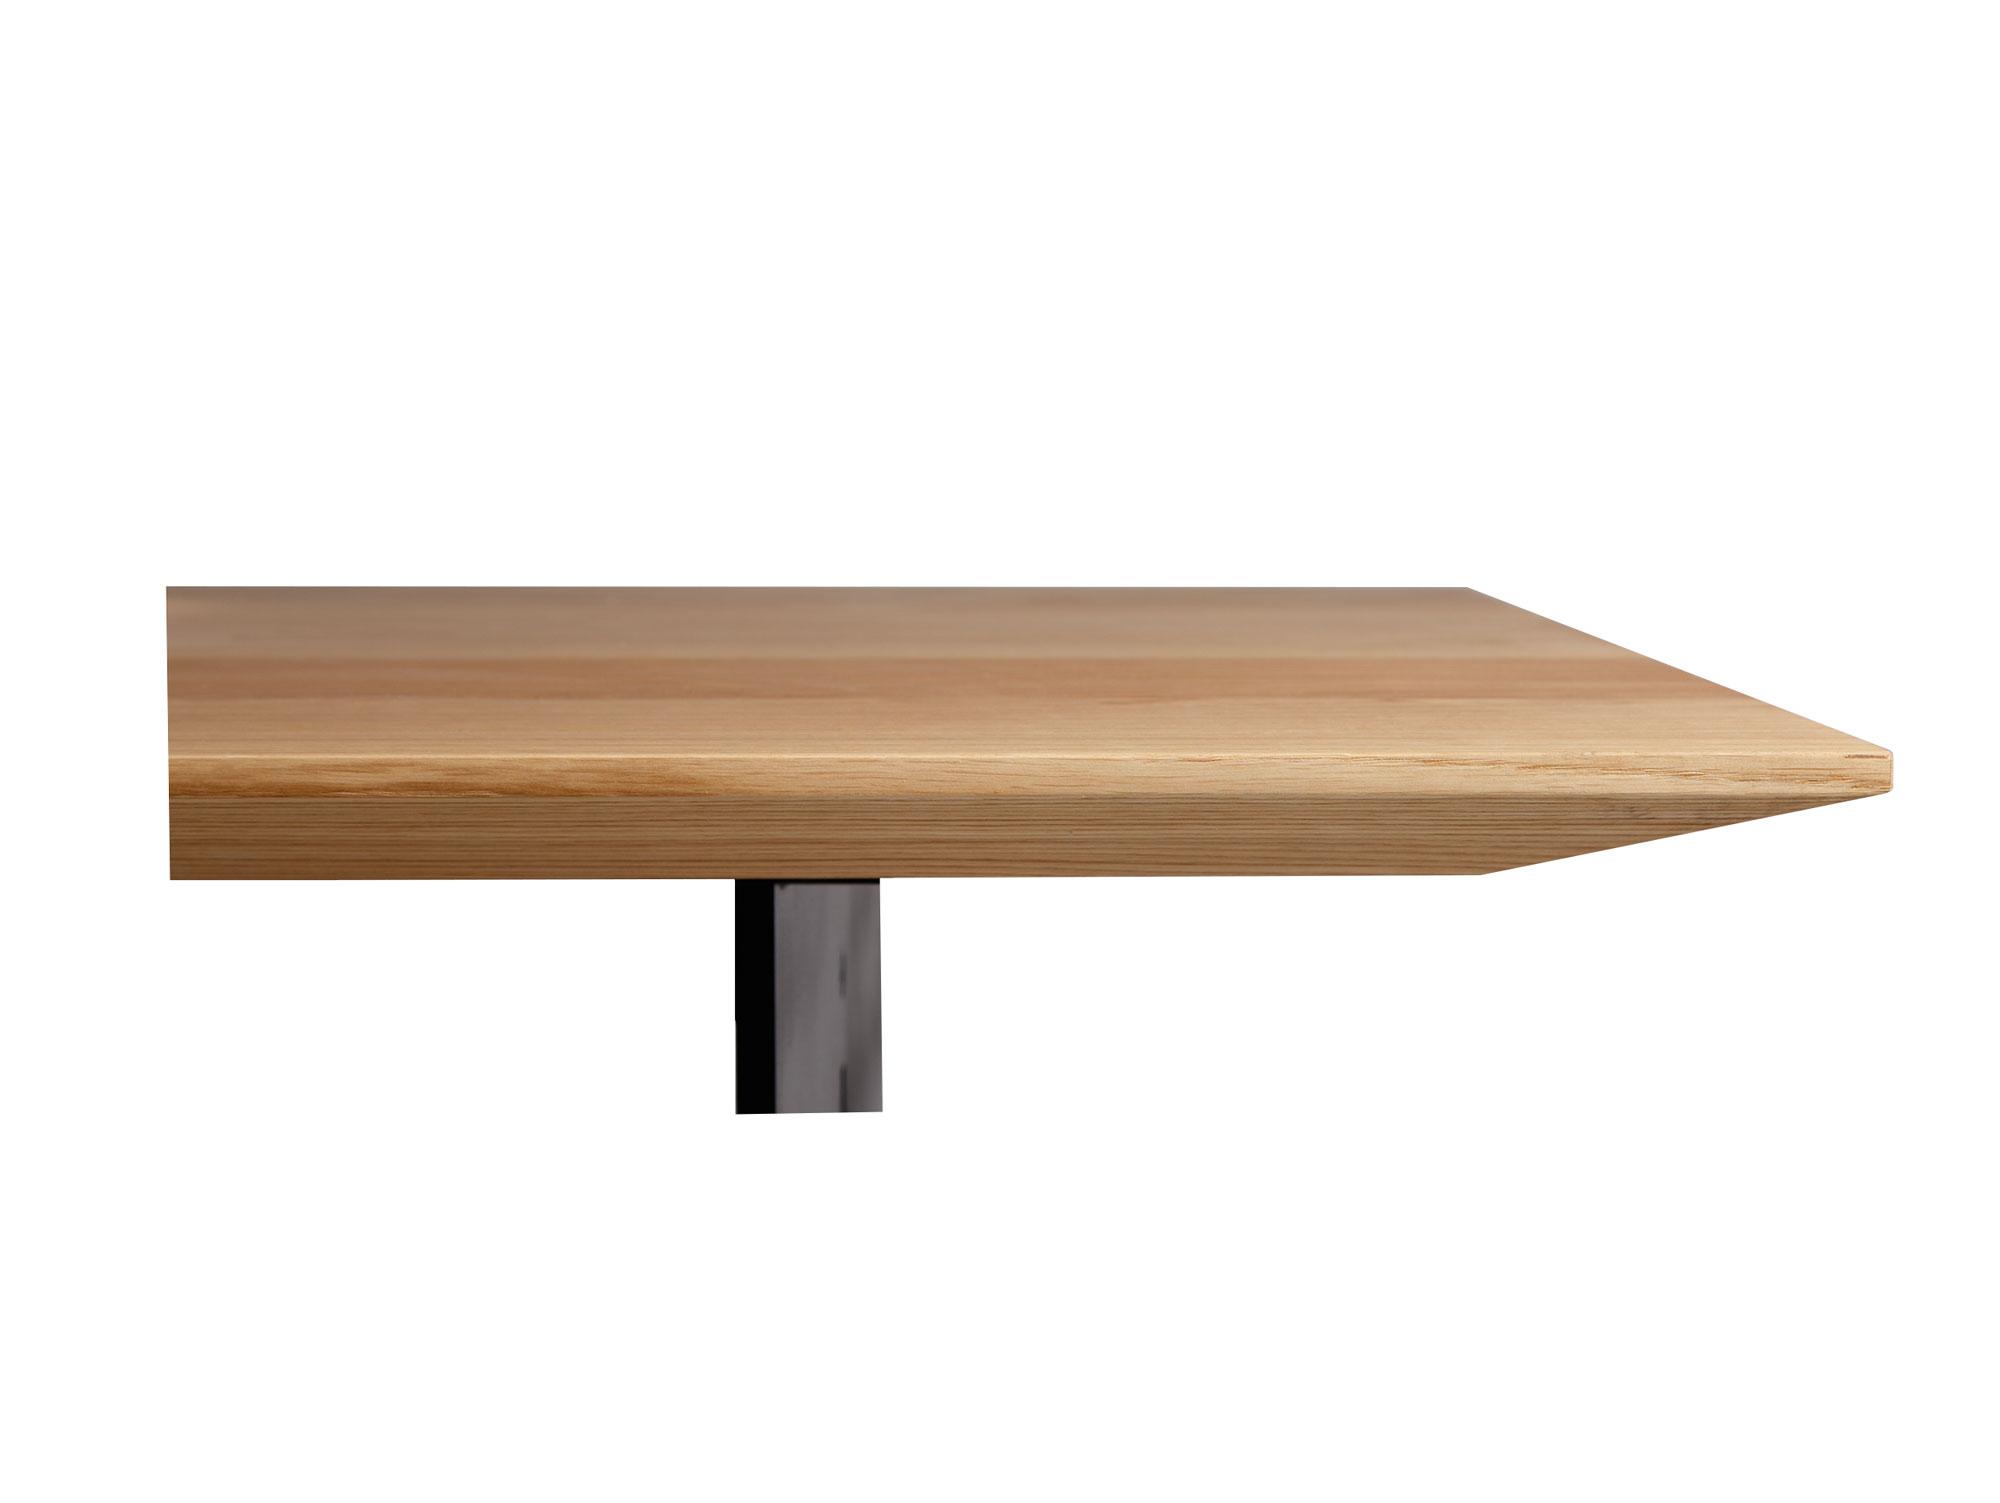 yorgi ma tisch esstisch. Black Bedroom Furniture Sets. Home Design Ideas